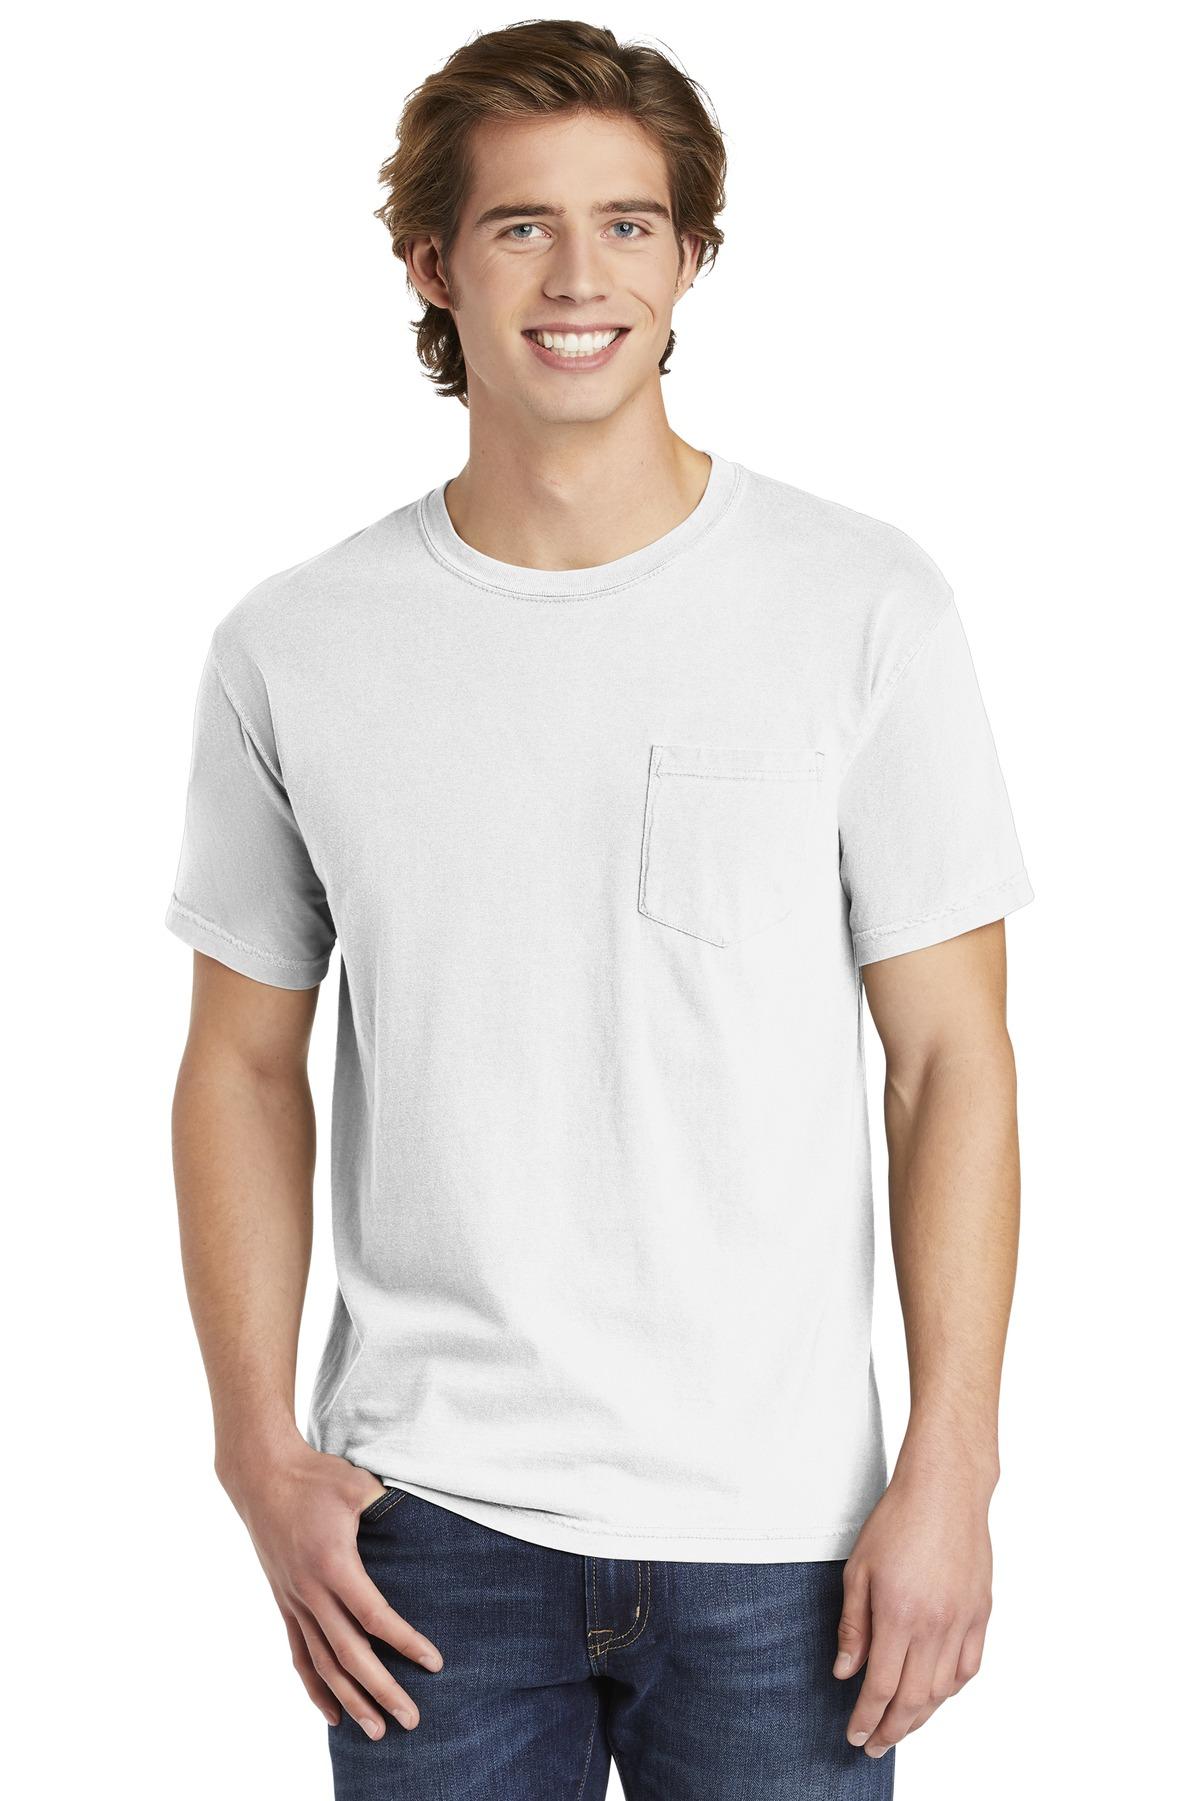 6-6.1 100% Cotton